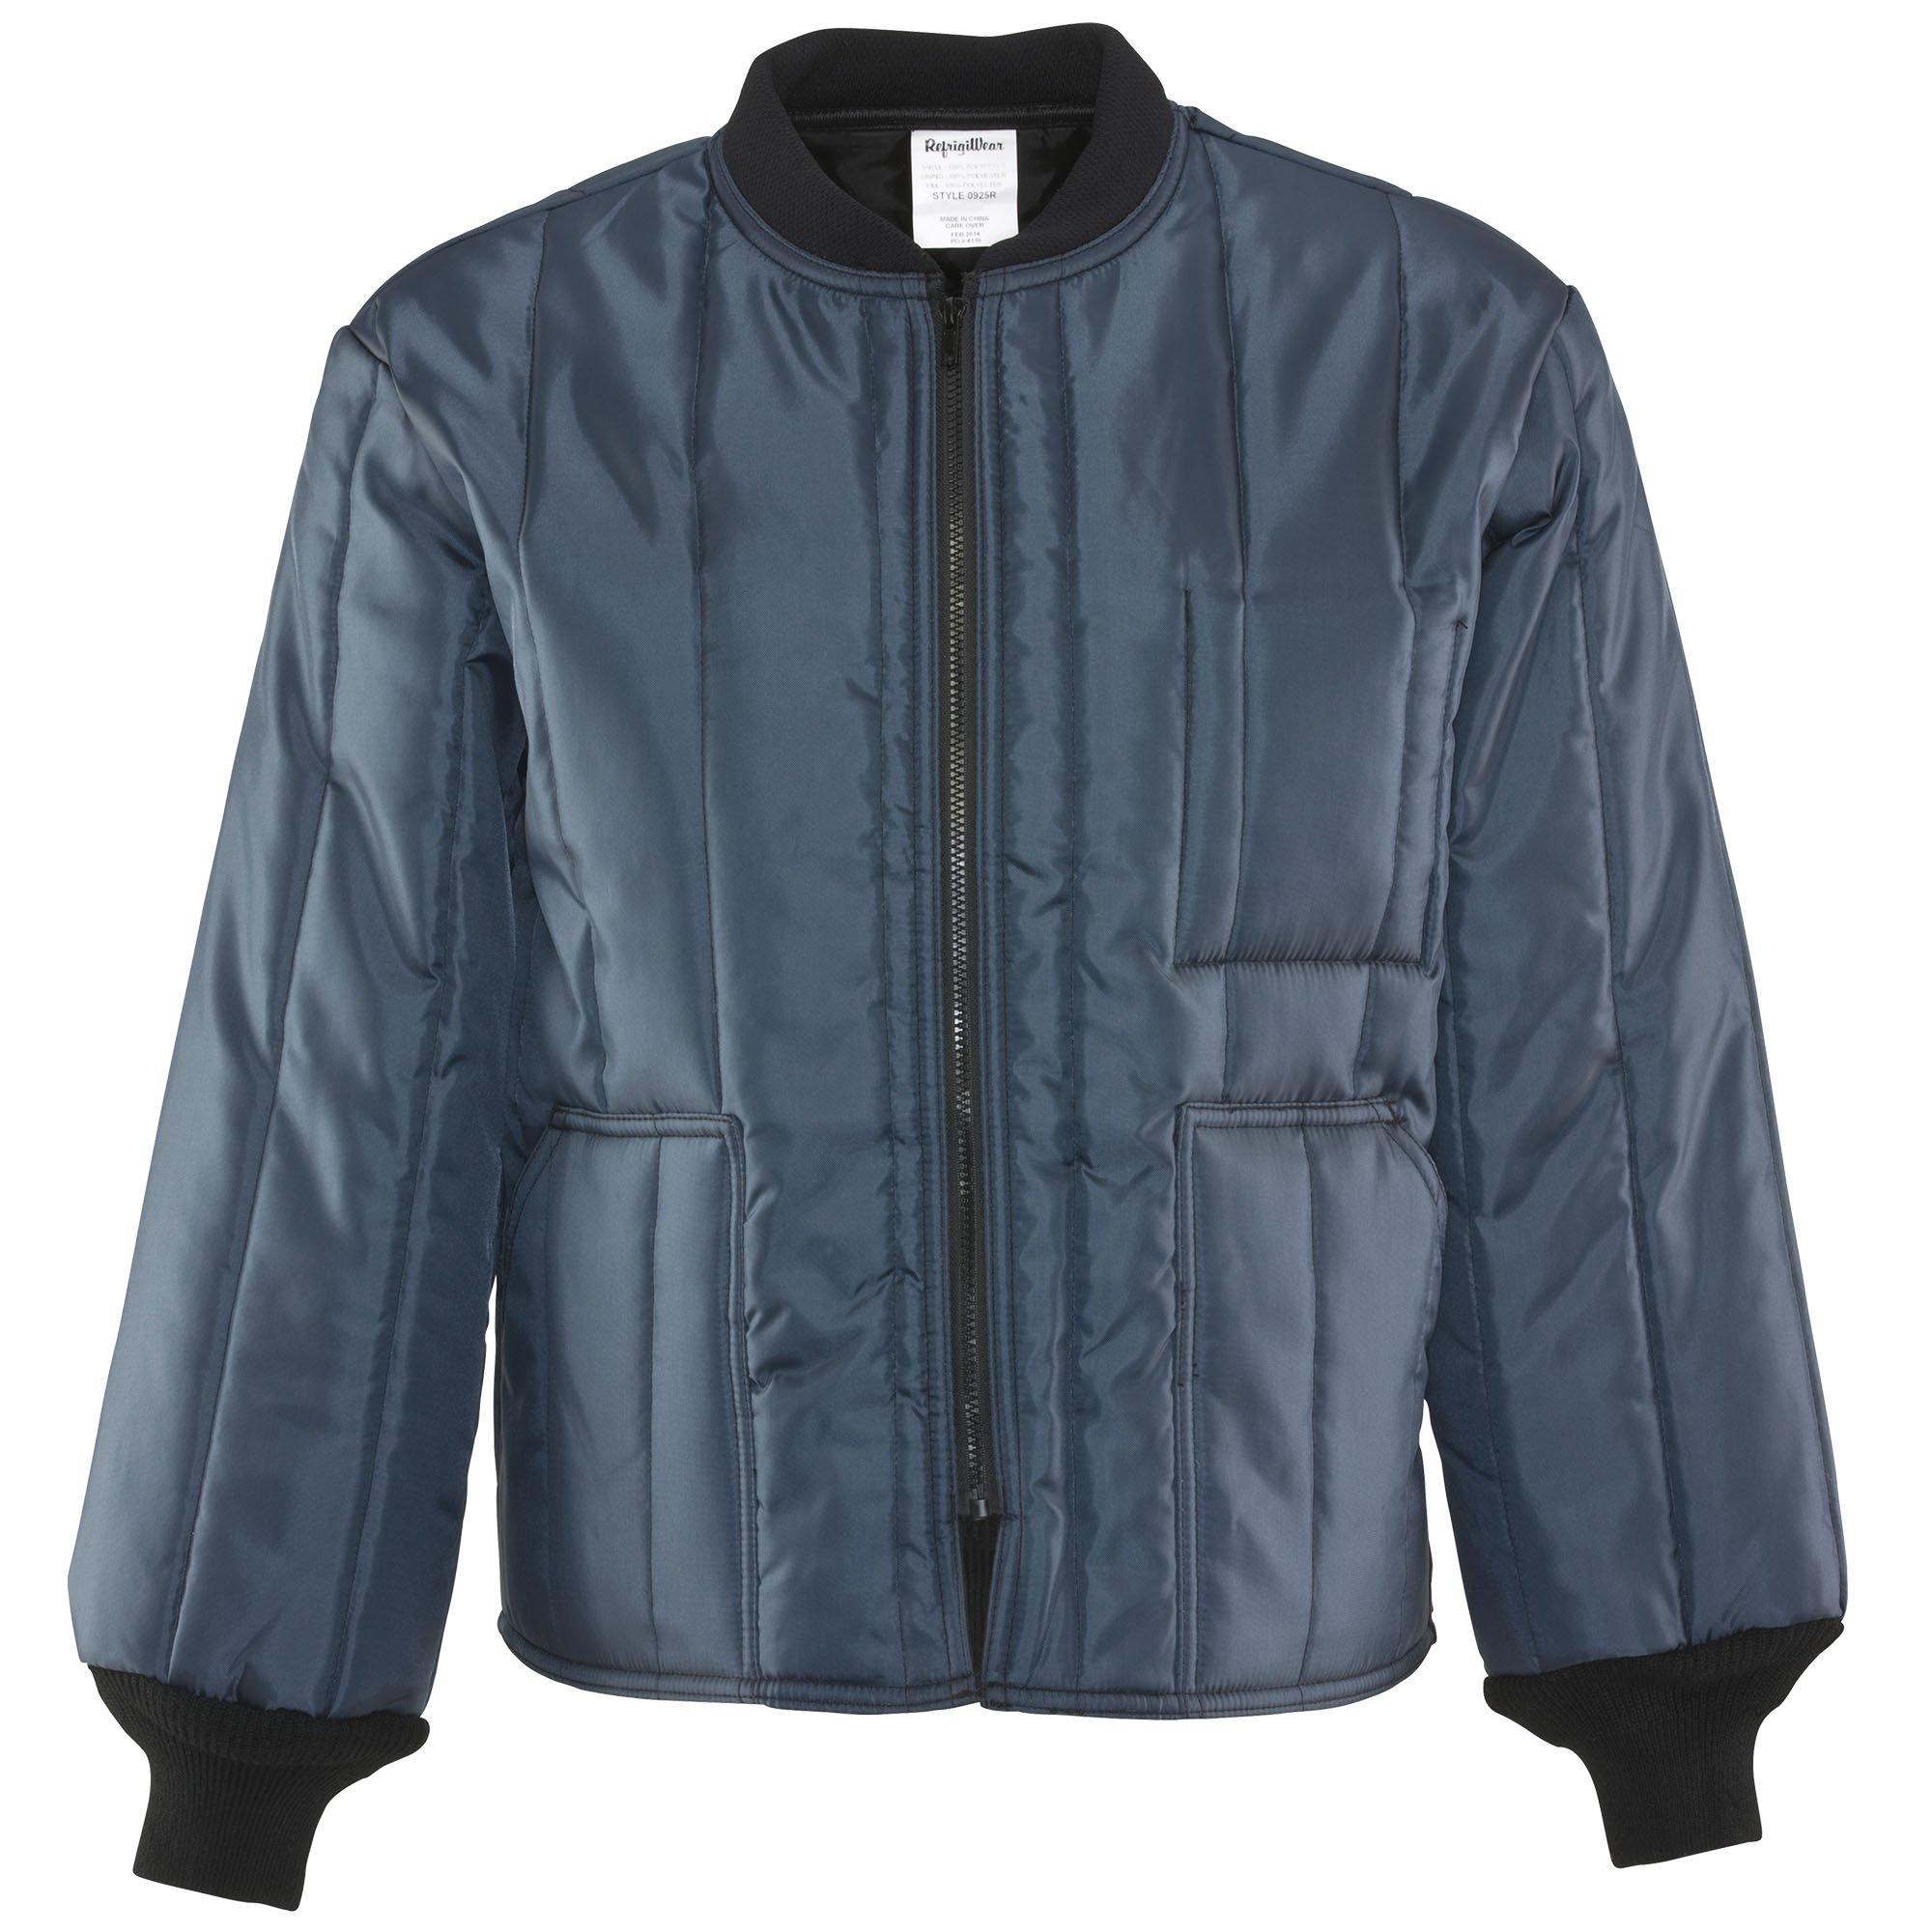 Refrigiwear Men's Lightweight Insulated Econo-Tuff Workwear Jacket (Navy Blue, XL)